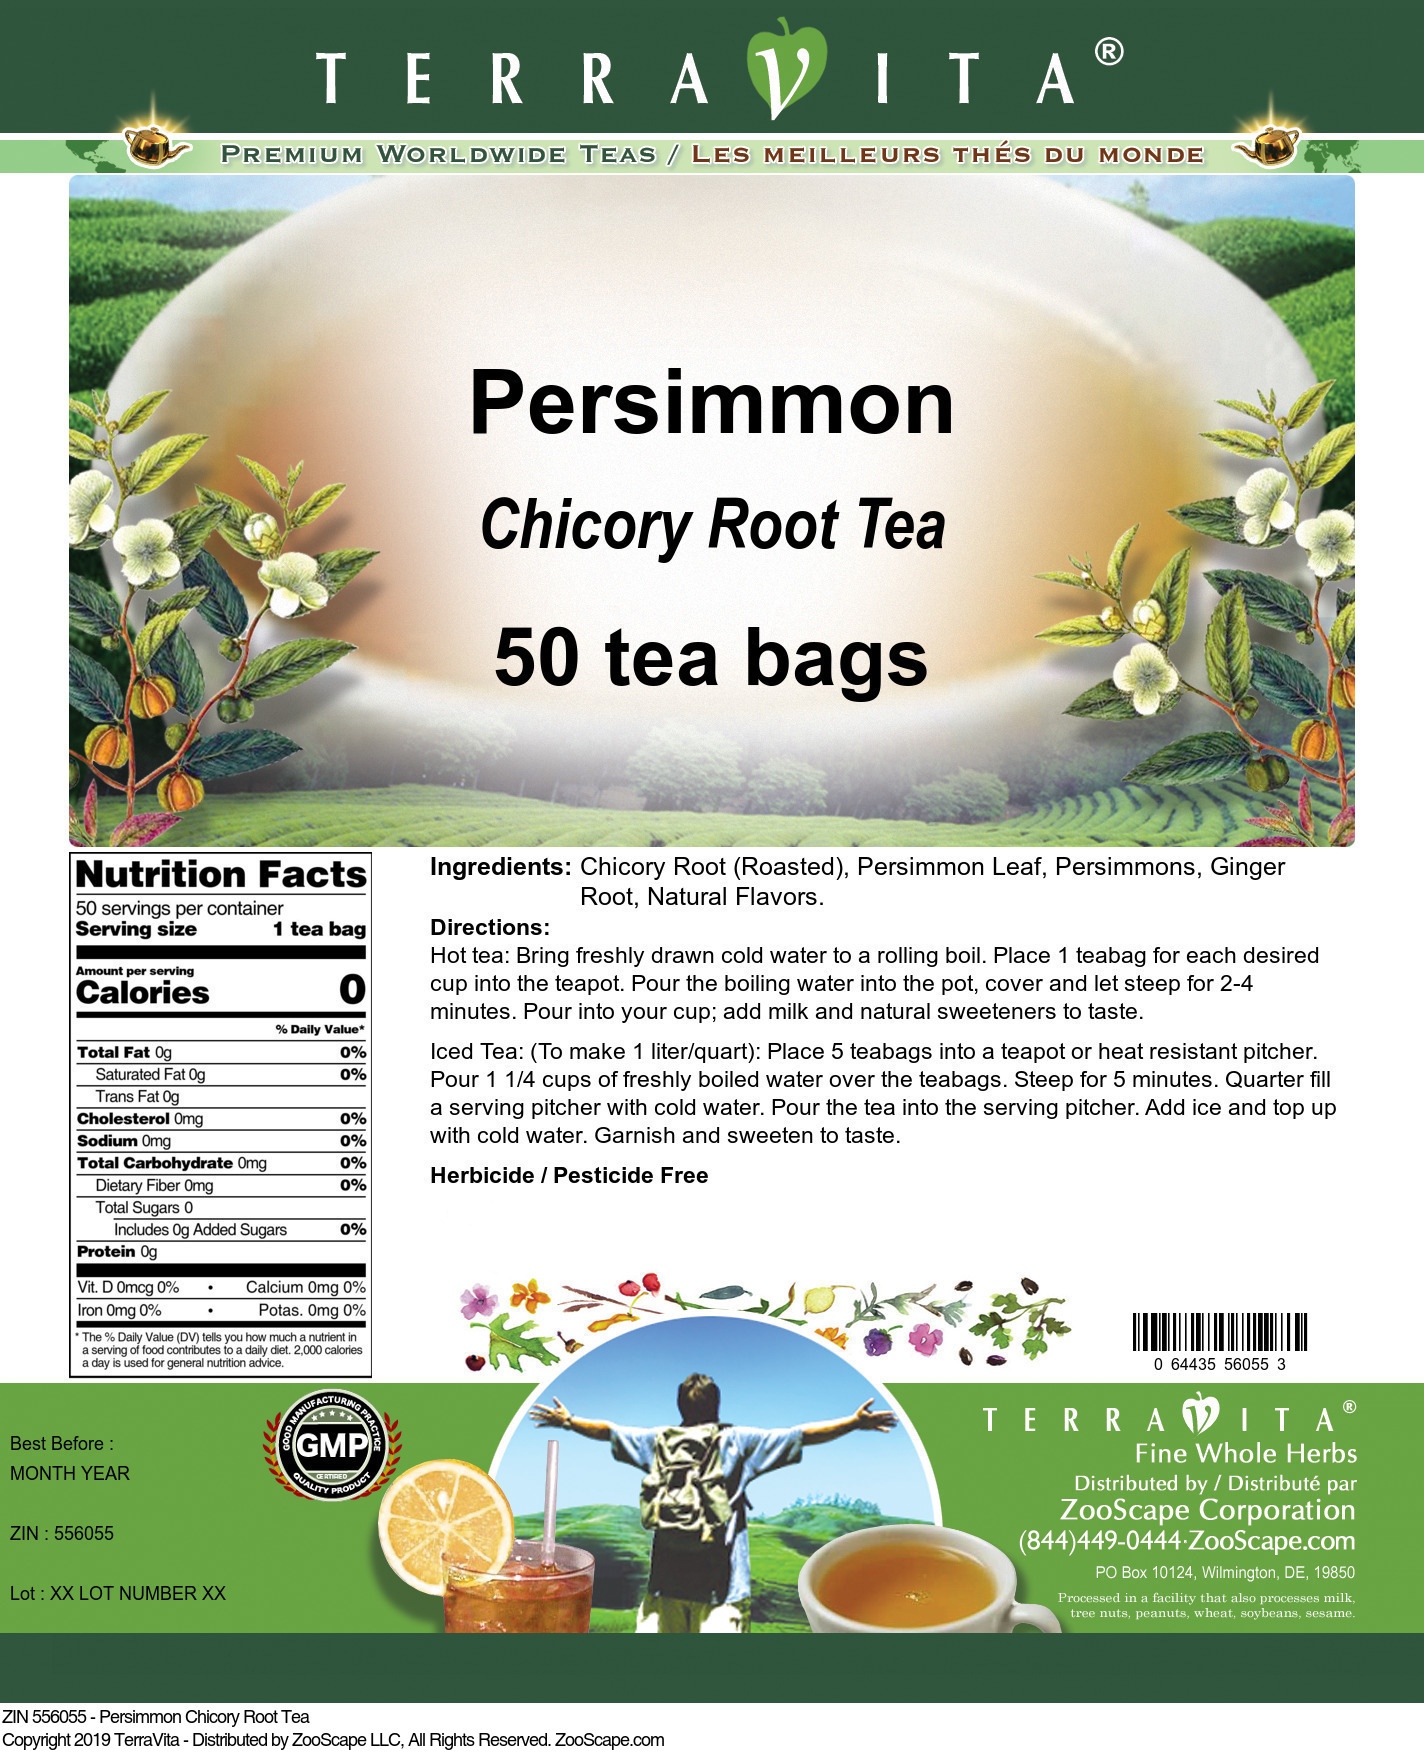 Persimmon Chicory Root Tea